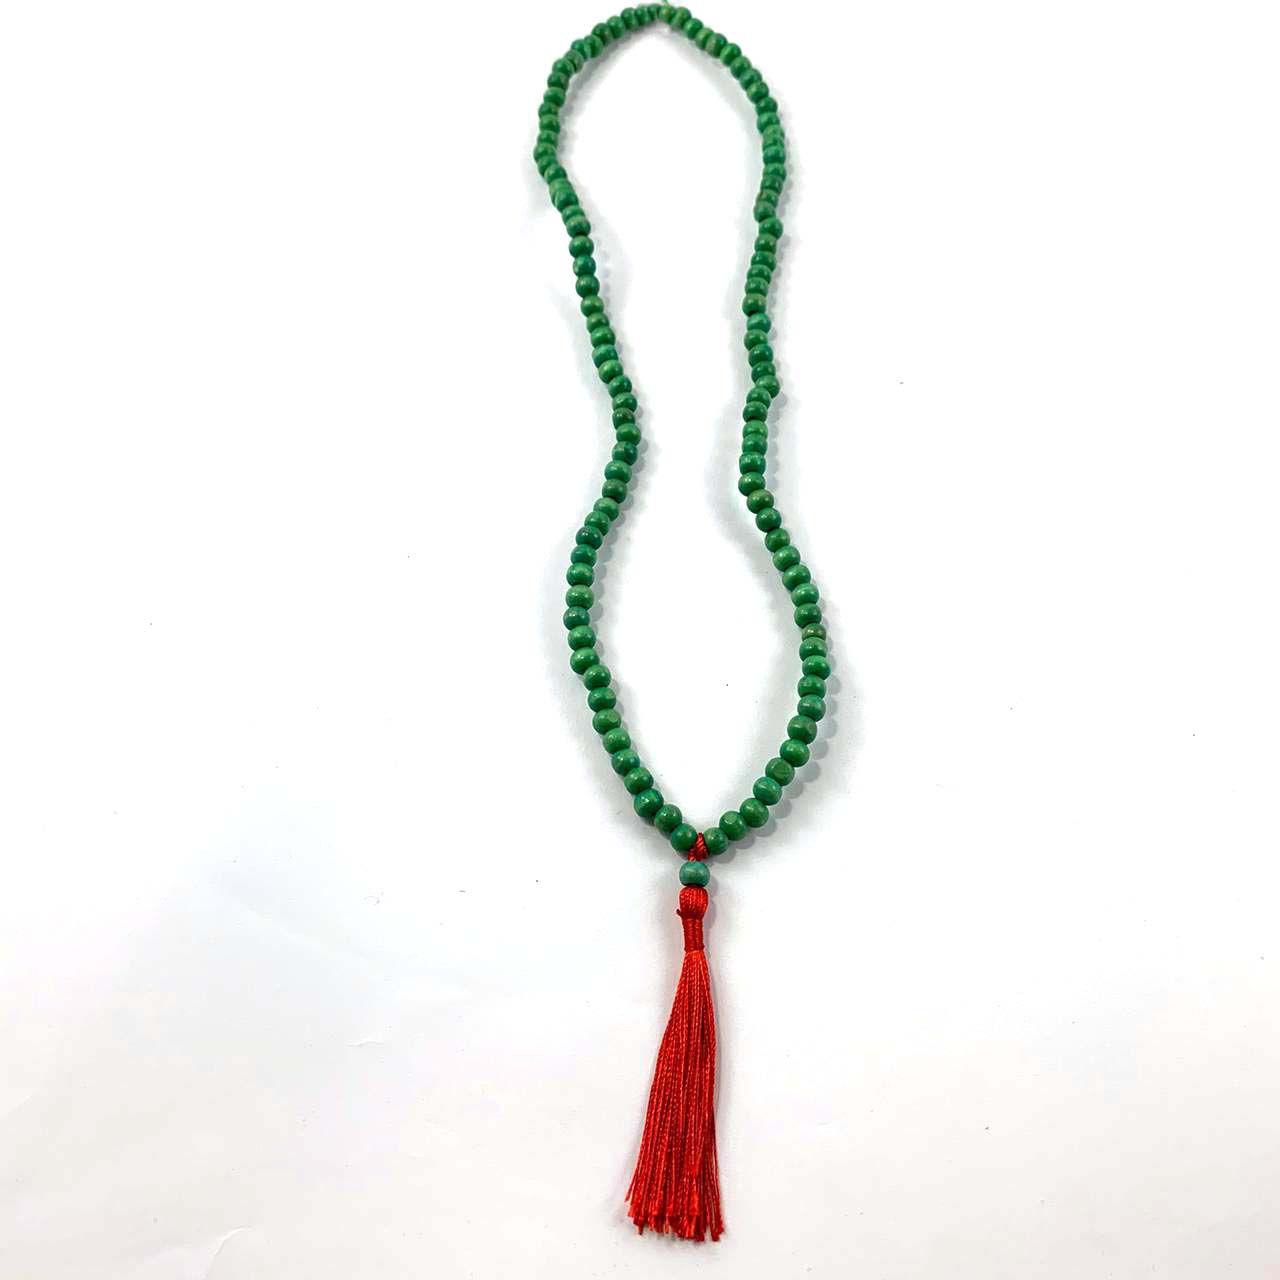 Colar Japamala Vermelha com Miçangas Verdes ( 36 cm )